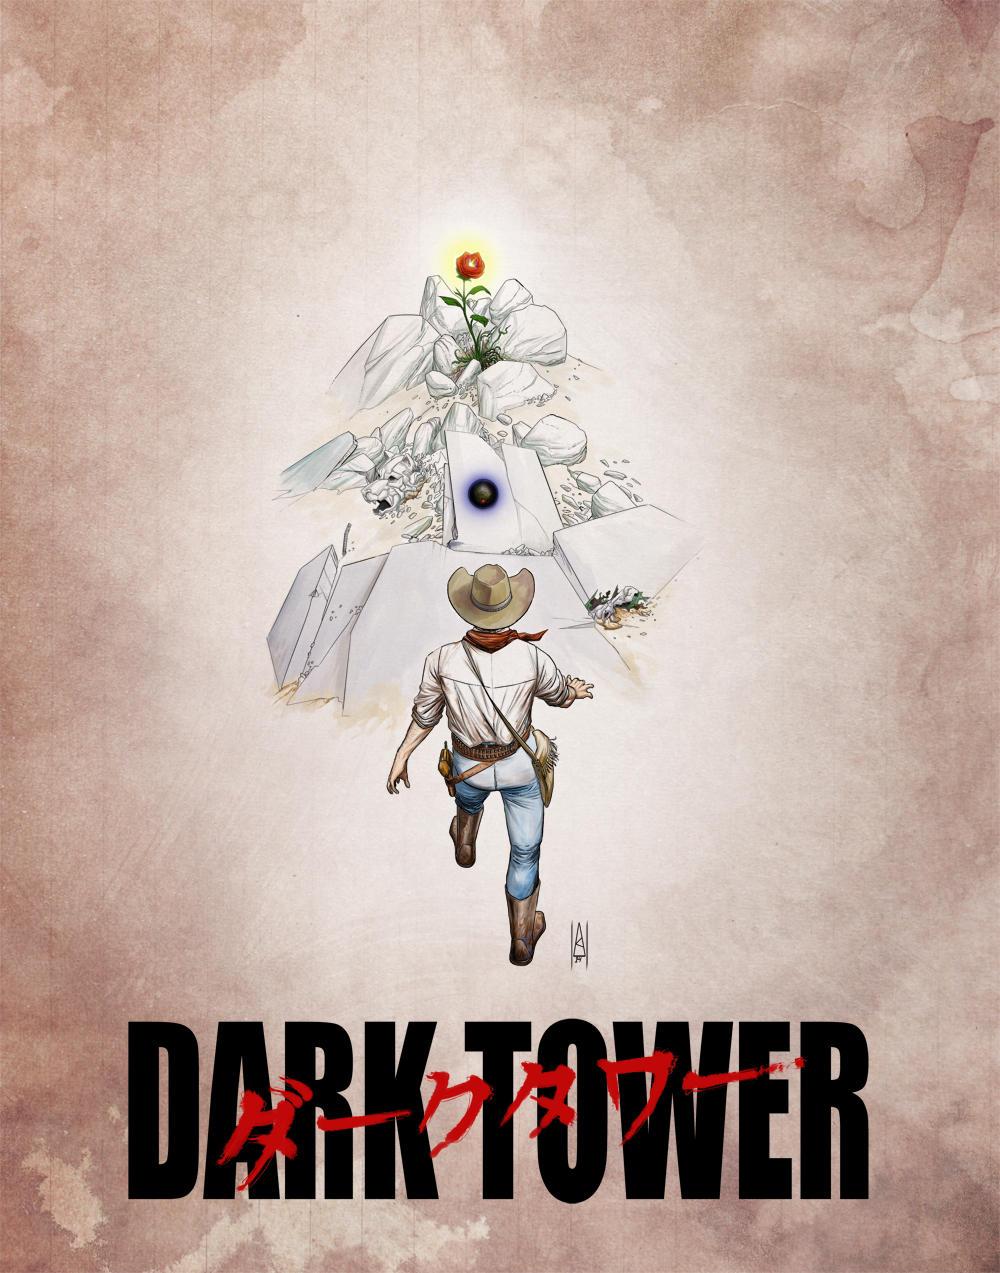 Dark Tower (ft. Akira) colored by Botonet